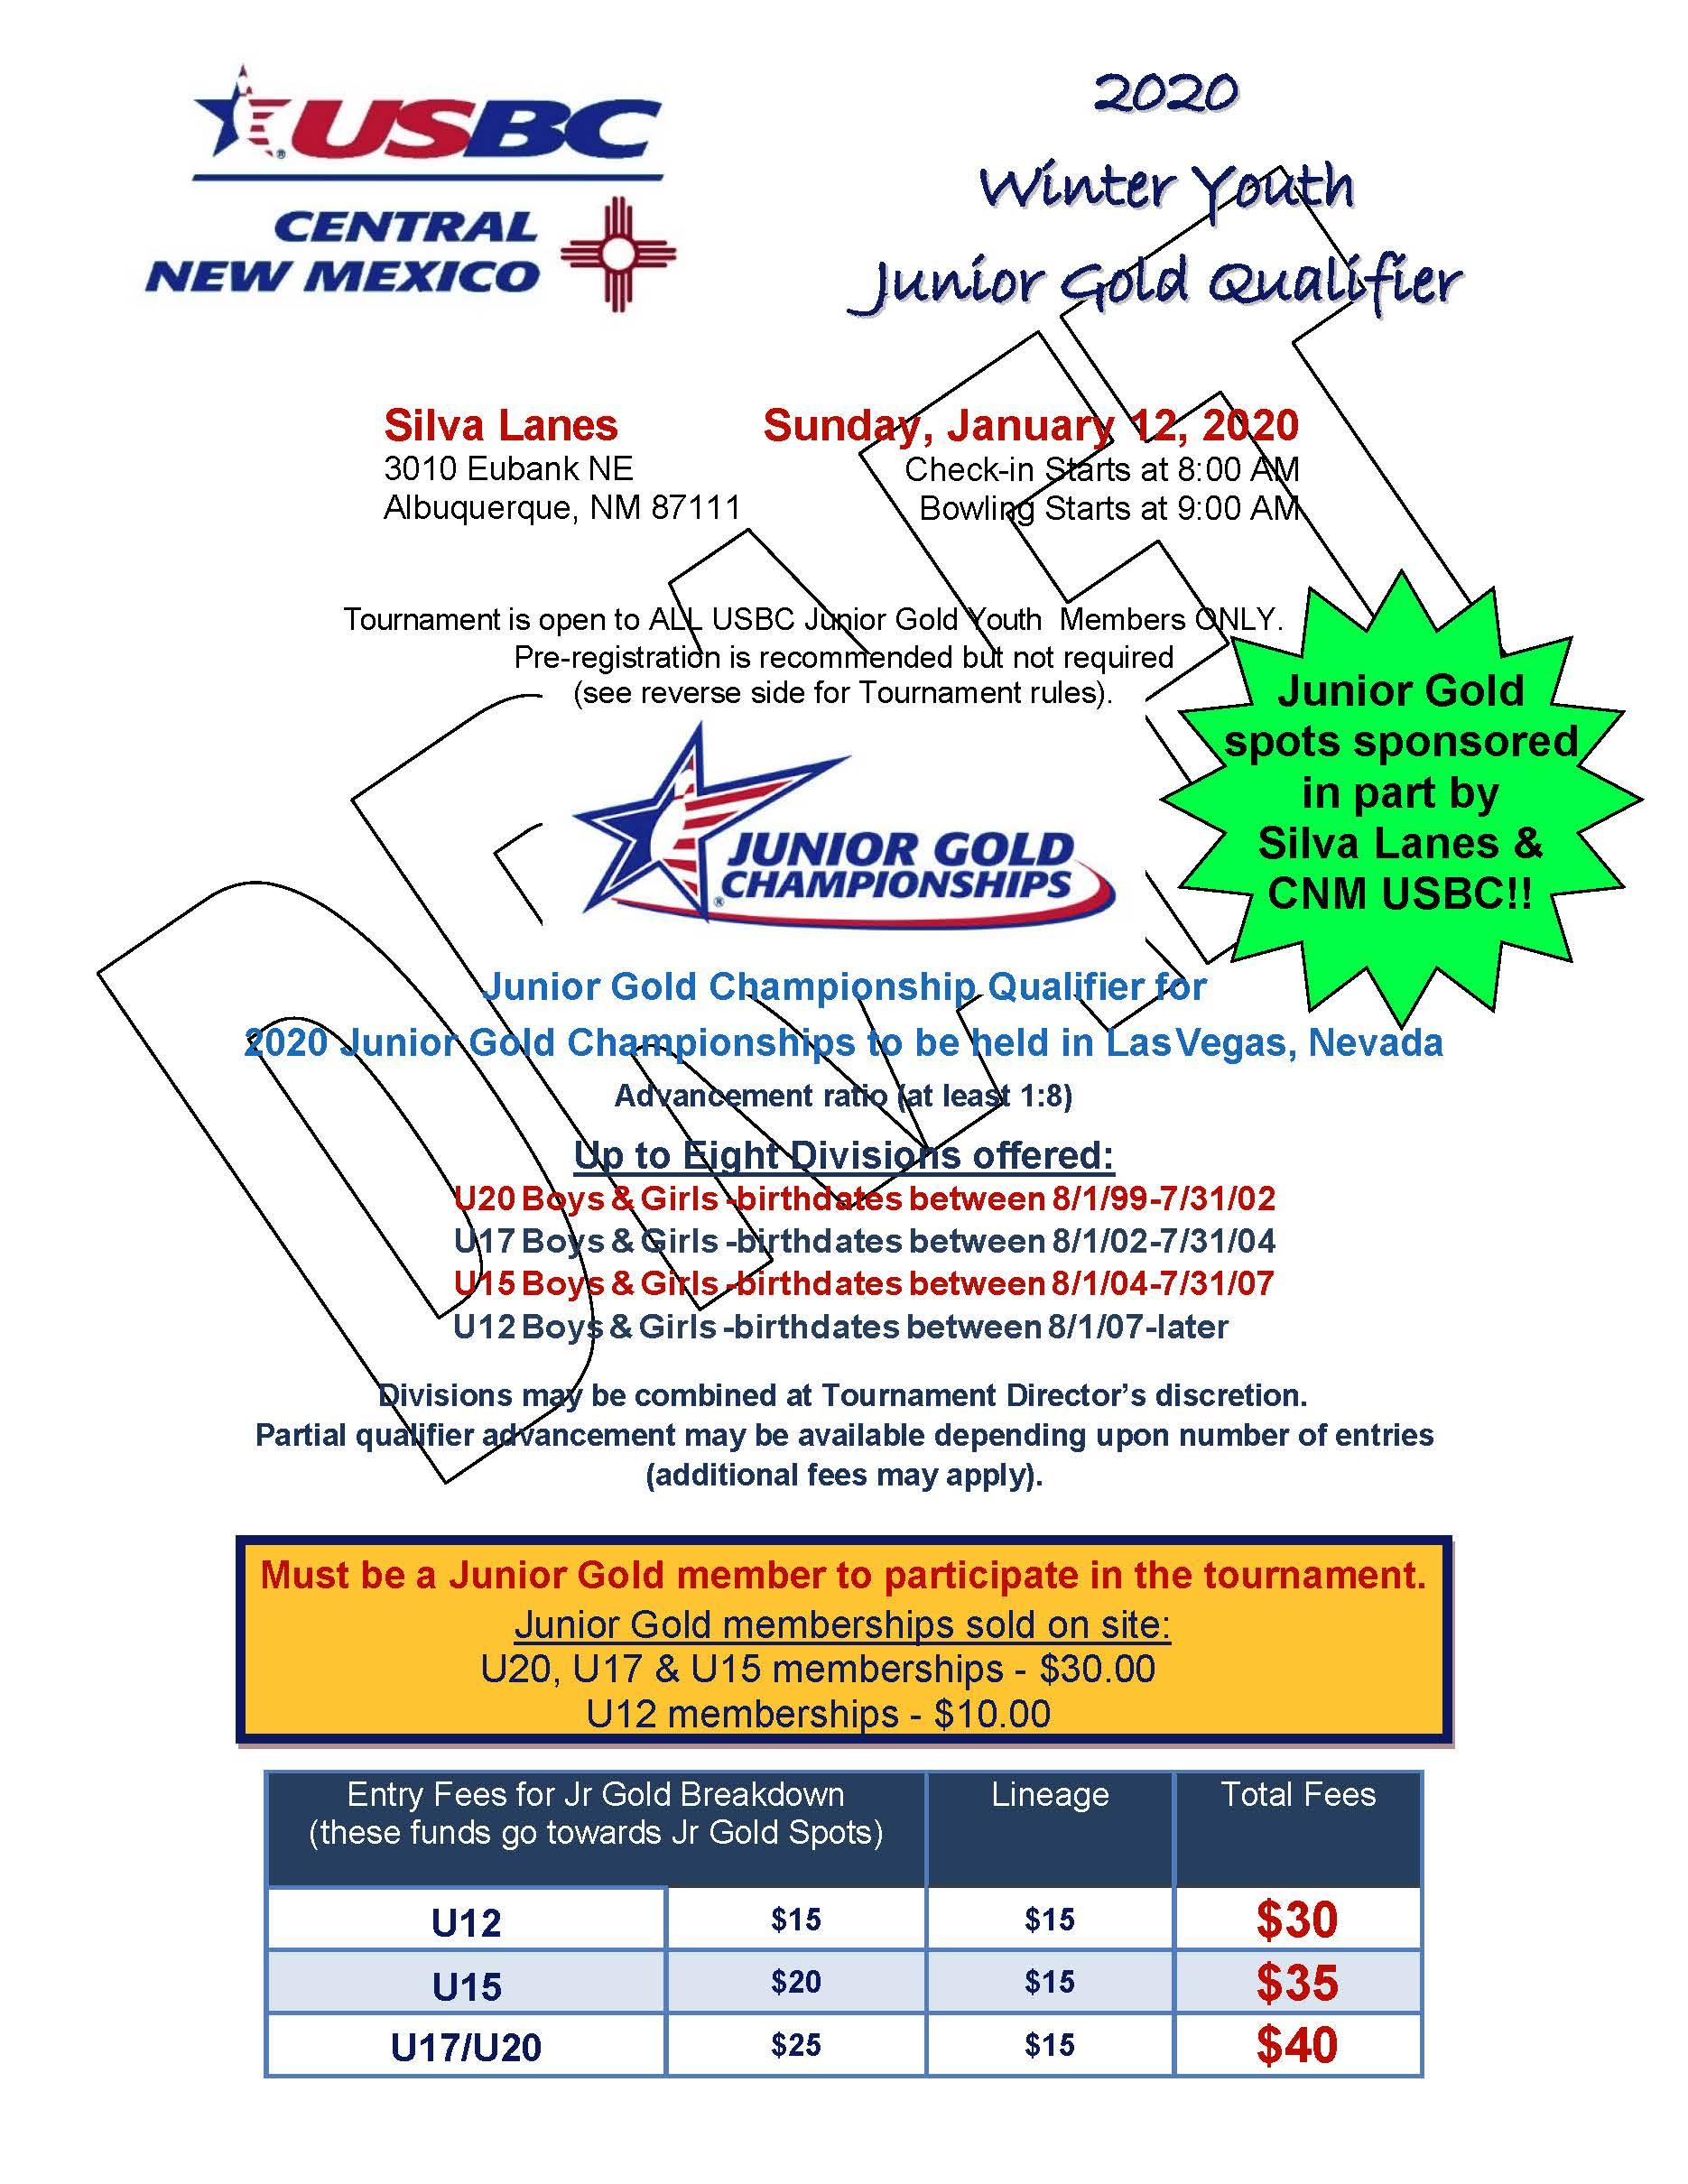 Winter Youth Junior Gold Qualifier Cnm Usbc